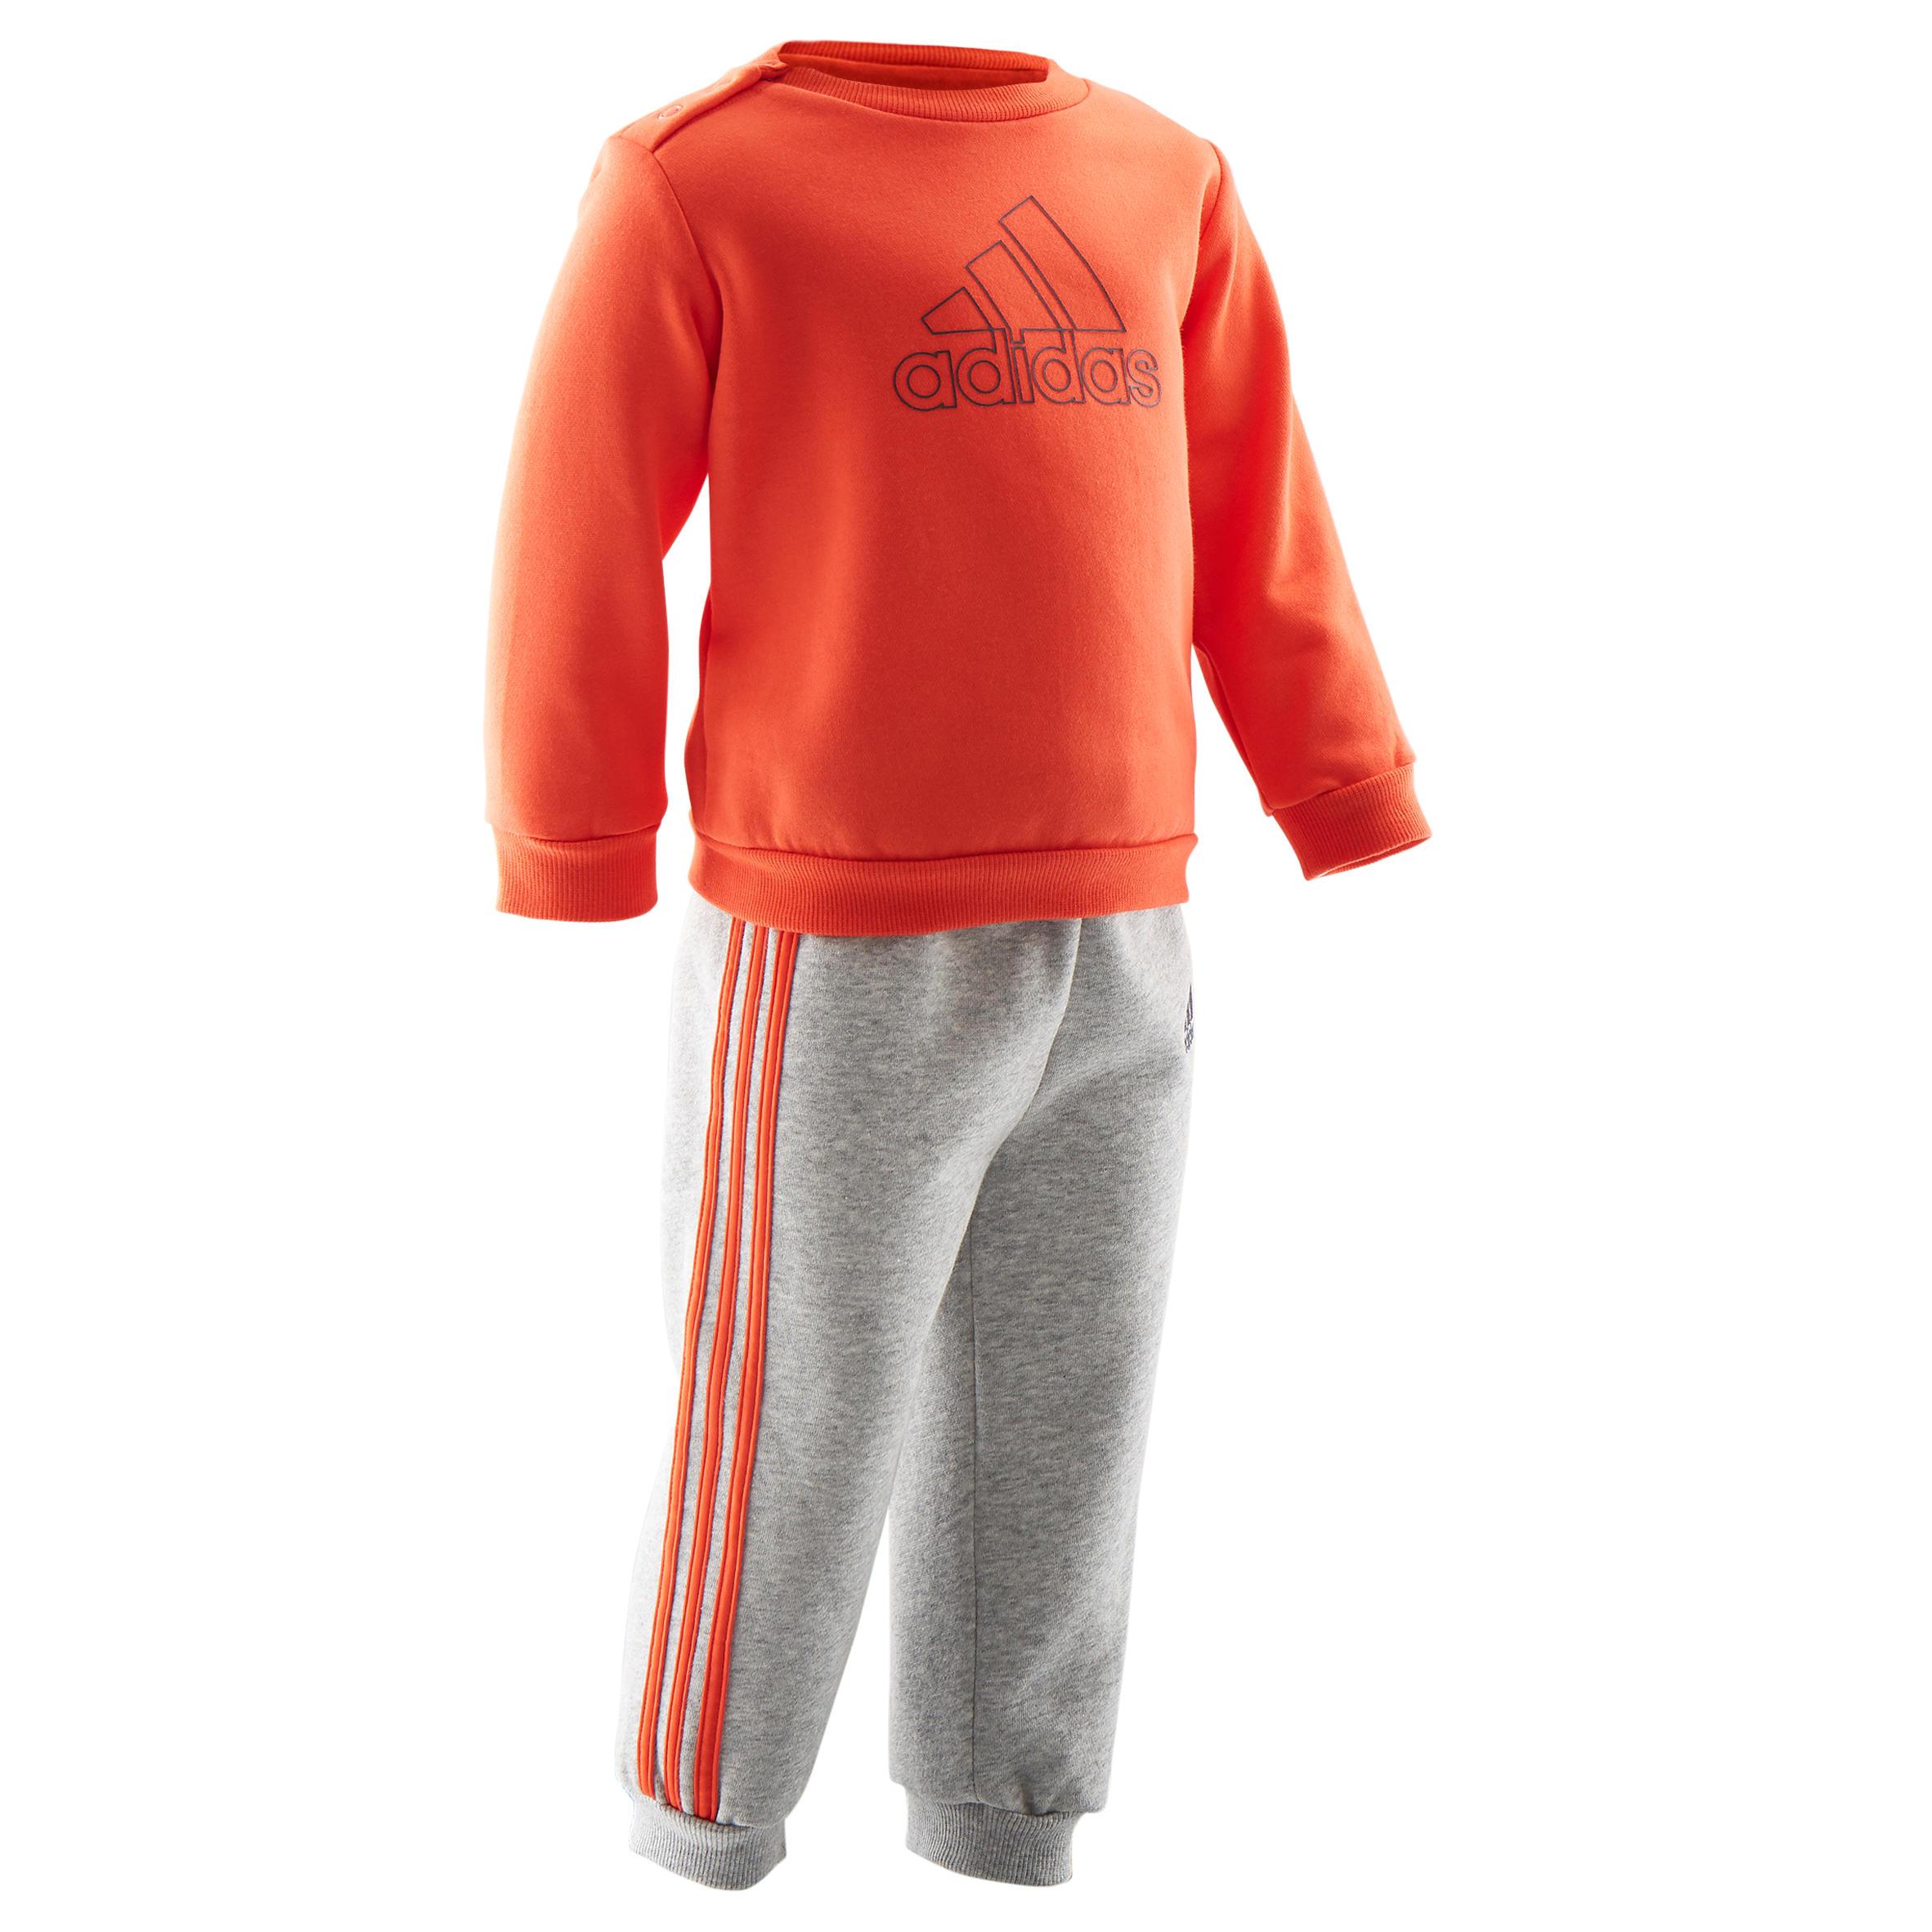 Trening Adidas roșu-gri Copii